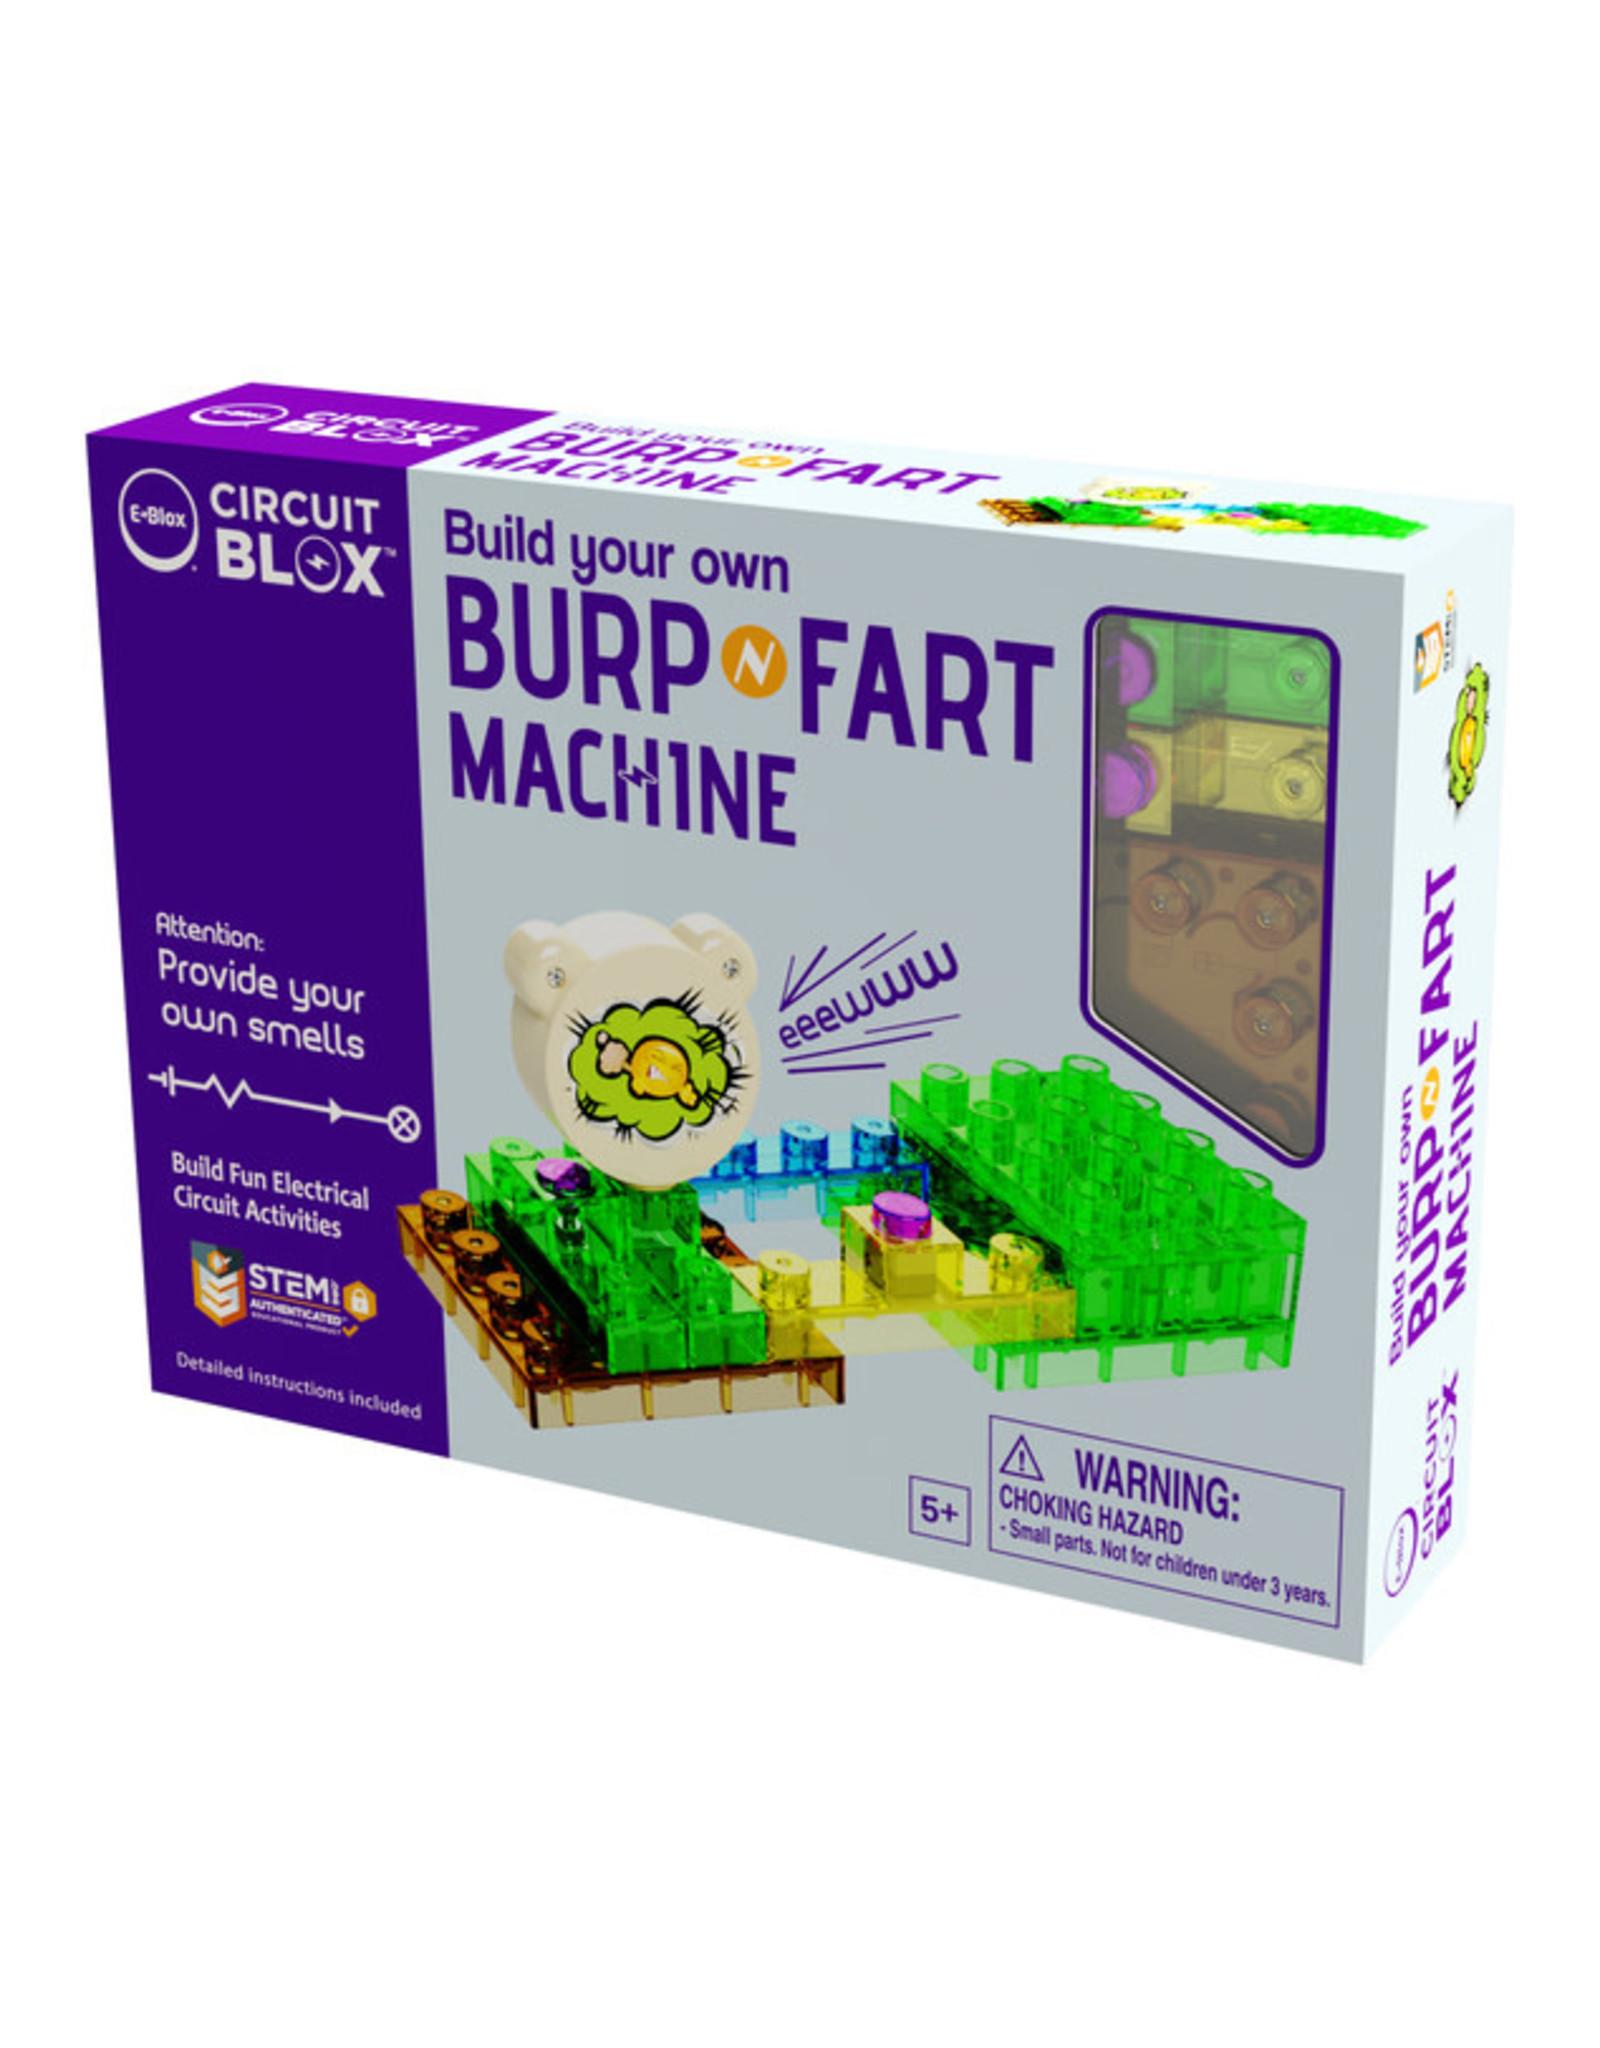 Burp & Fart Machine